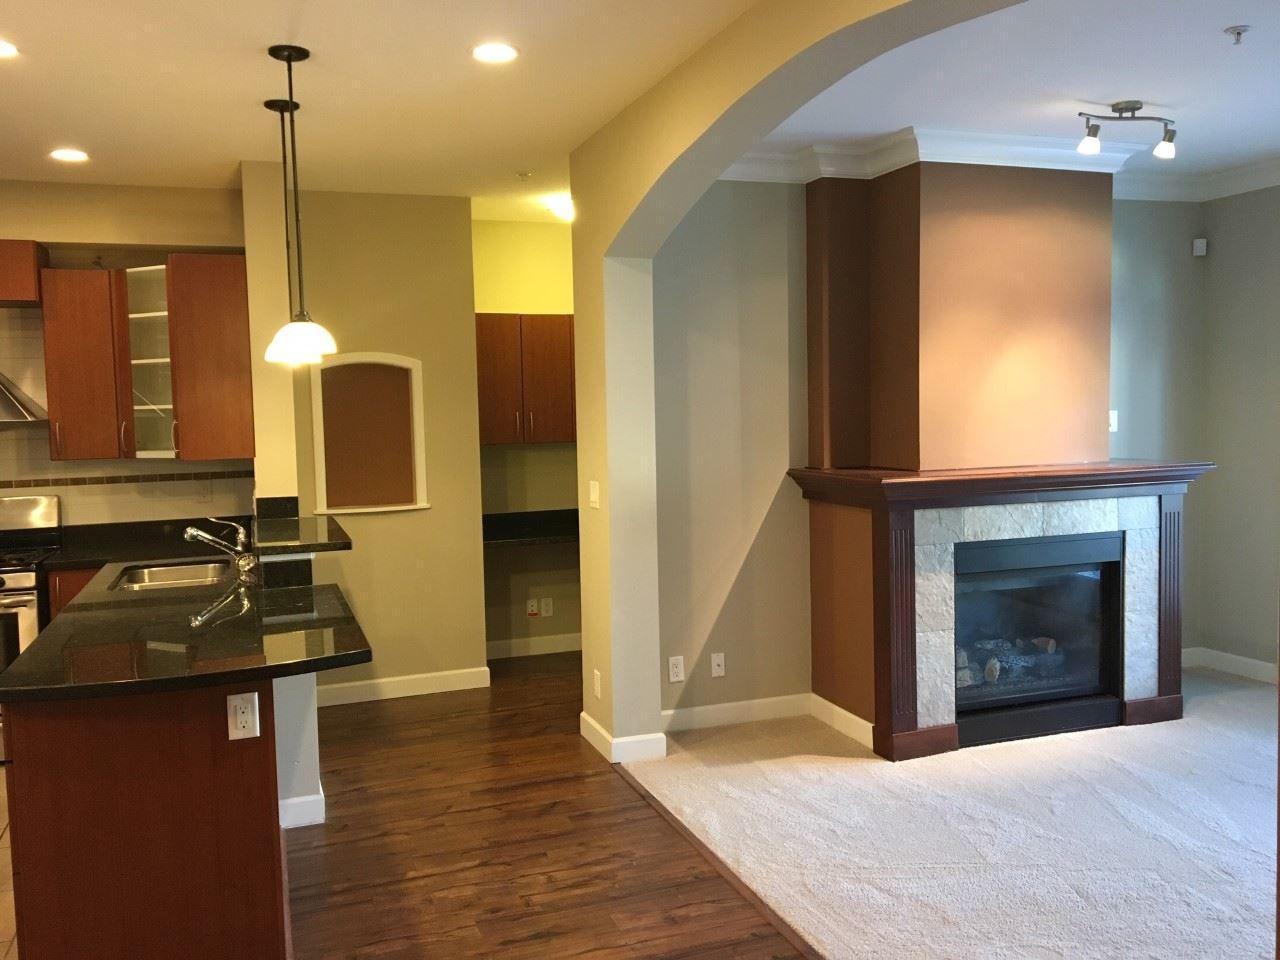 "Main Photo: 203 976 ADAIR Avenue in Coquitlam: Central Coquitlam Condo for sale in ""Orleans Ridge"" : MLS®# R2330298"